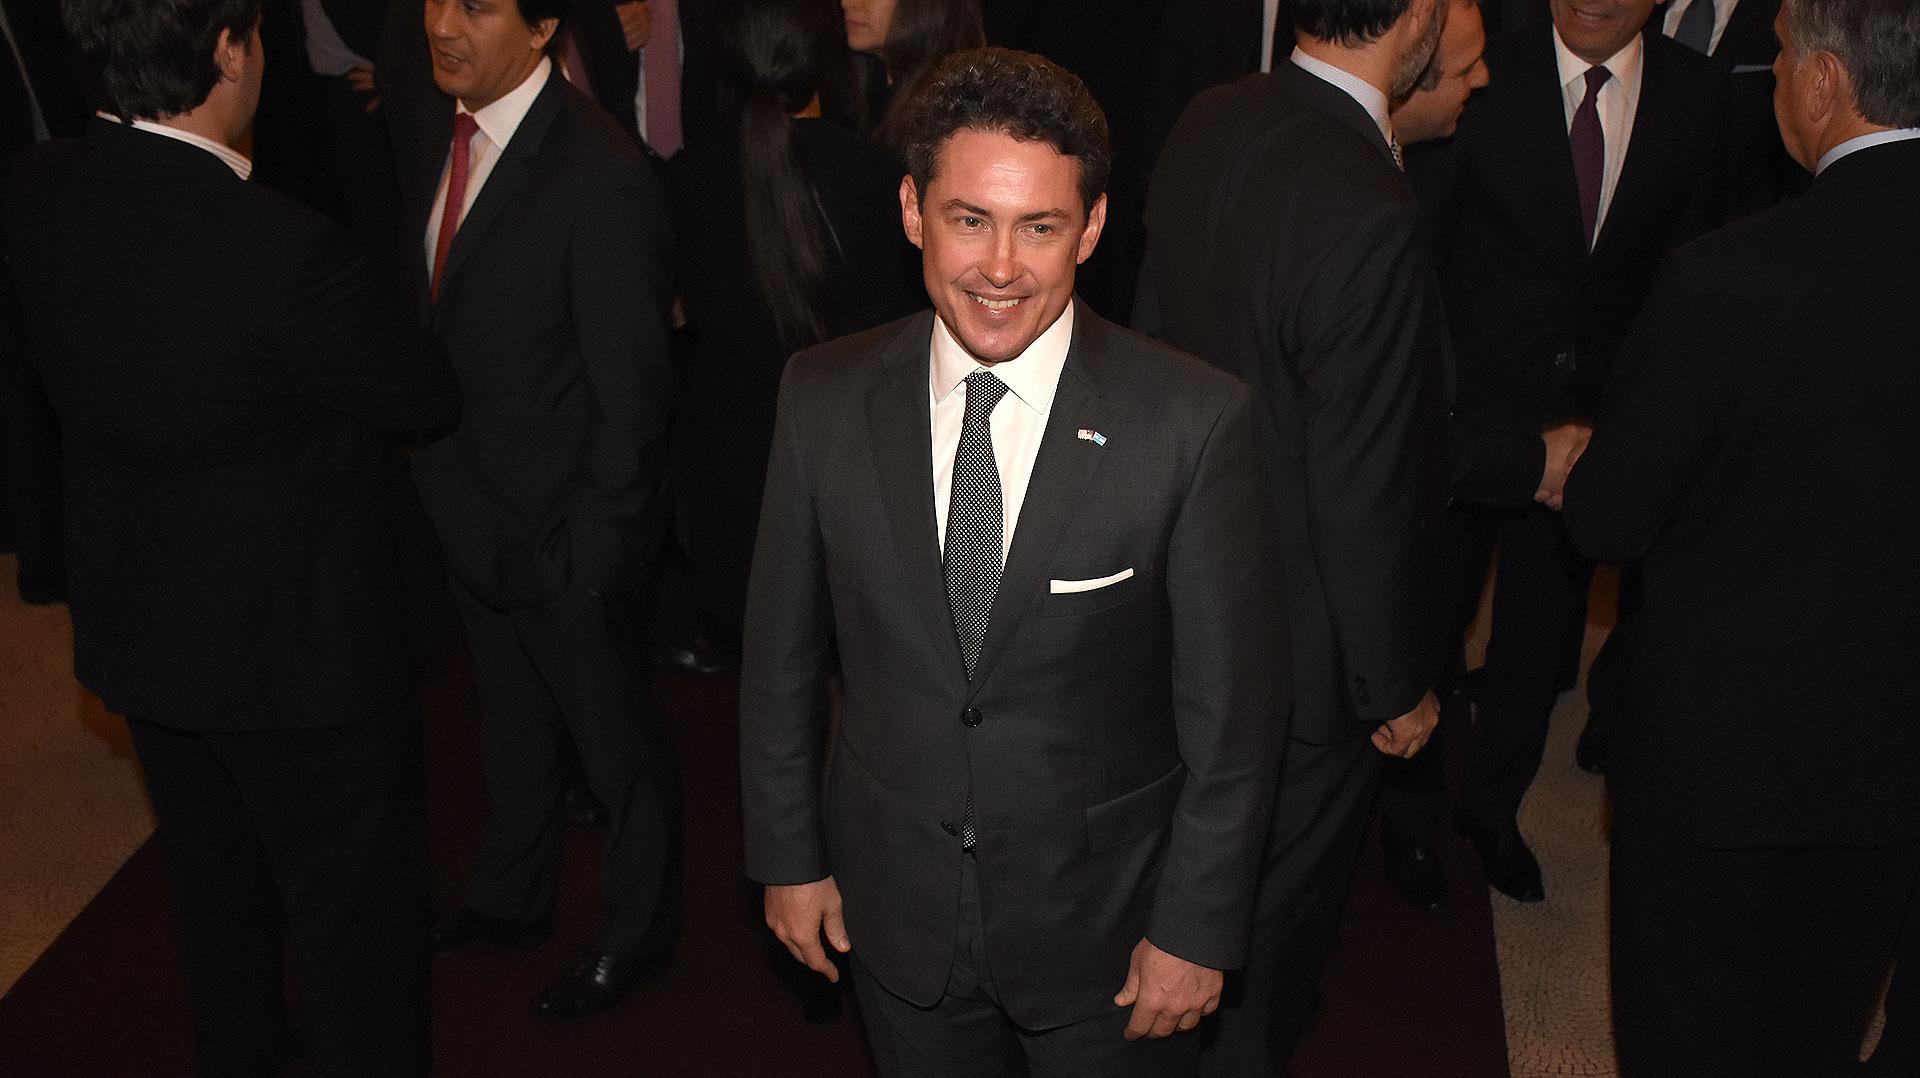 Noah Mamet, embajador de los EEUU en Argentina